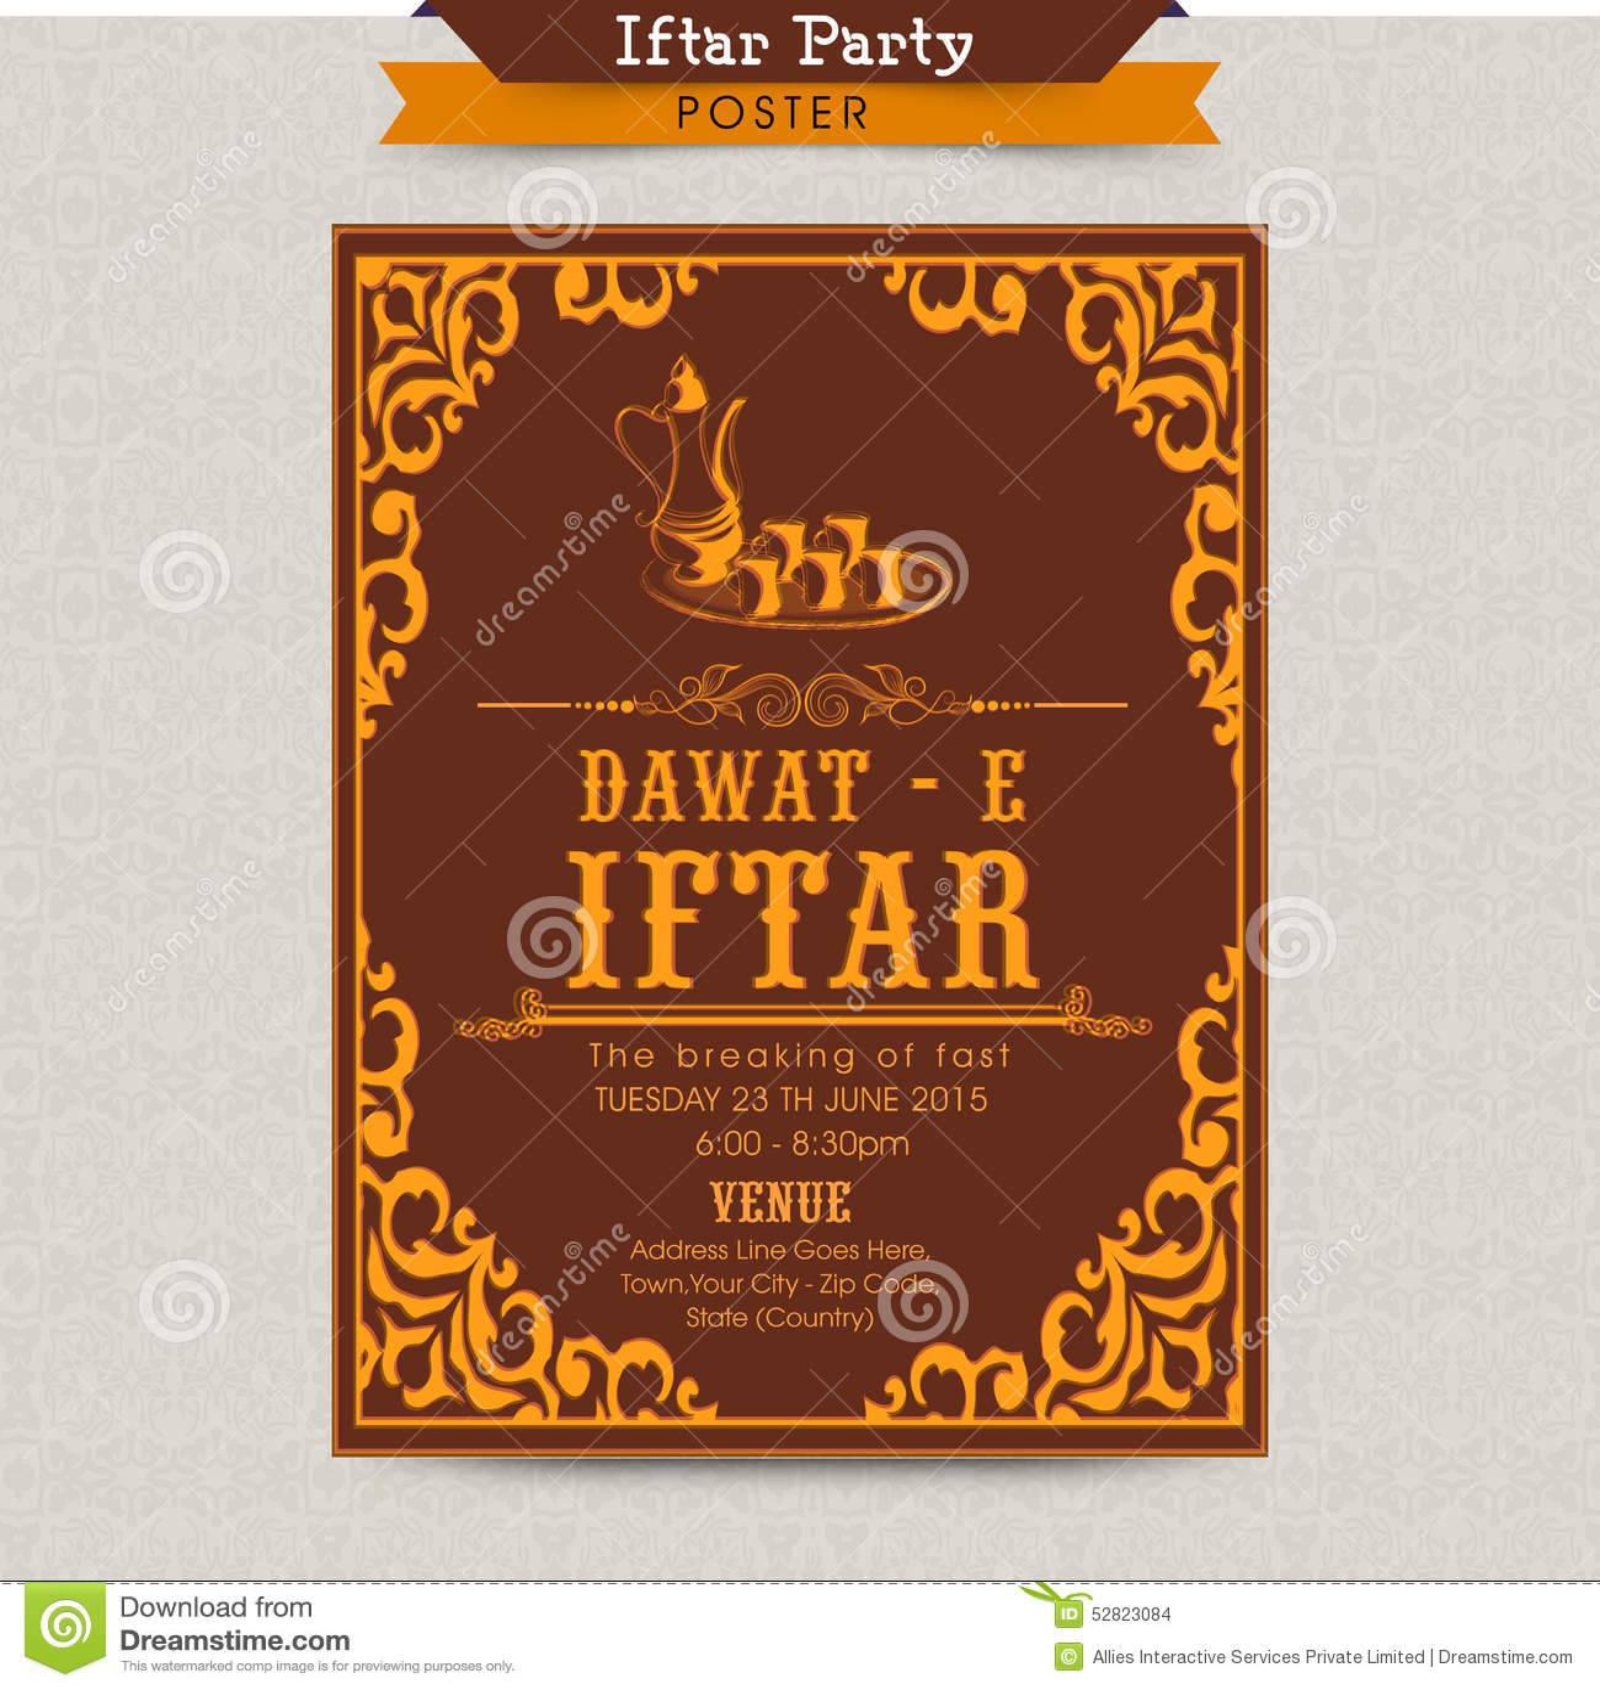 Invitation card for ramadan kareem iftar party celebration stock floral invitation card for ramadan kareem iftar party celebration stock images stopboris Choice Image